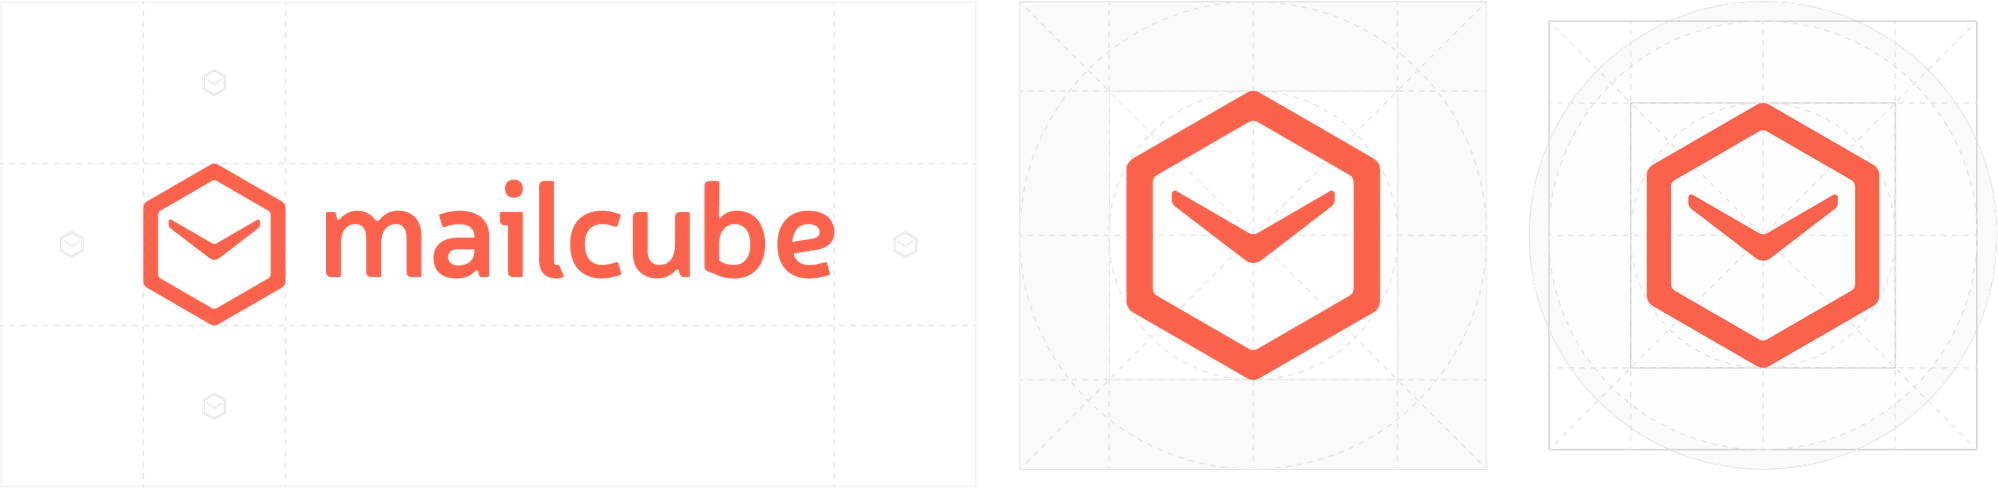 Mailcube Logo